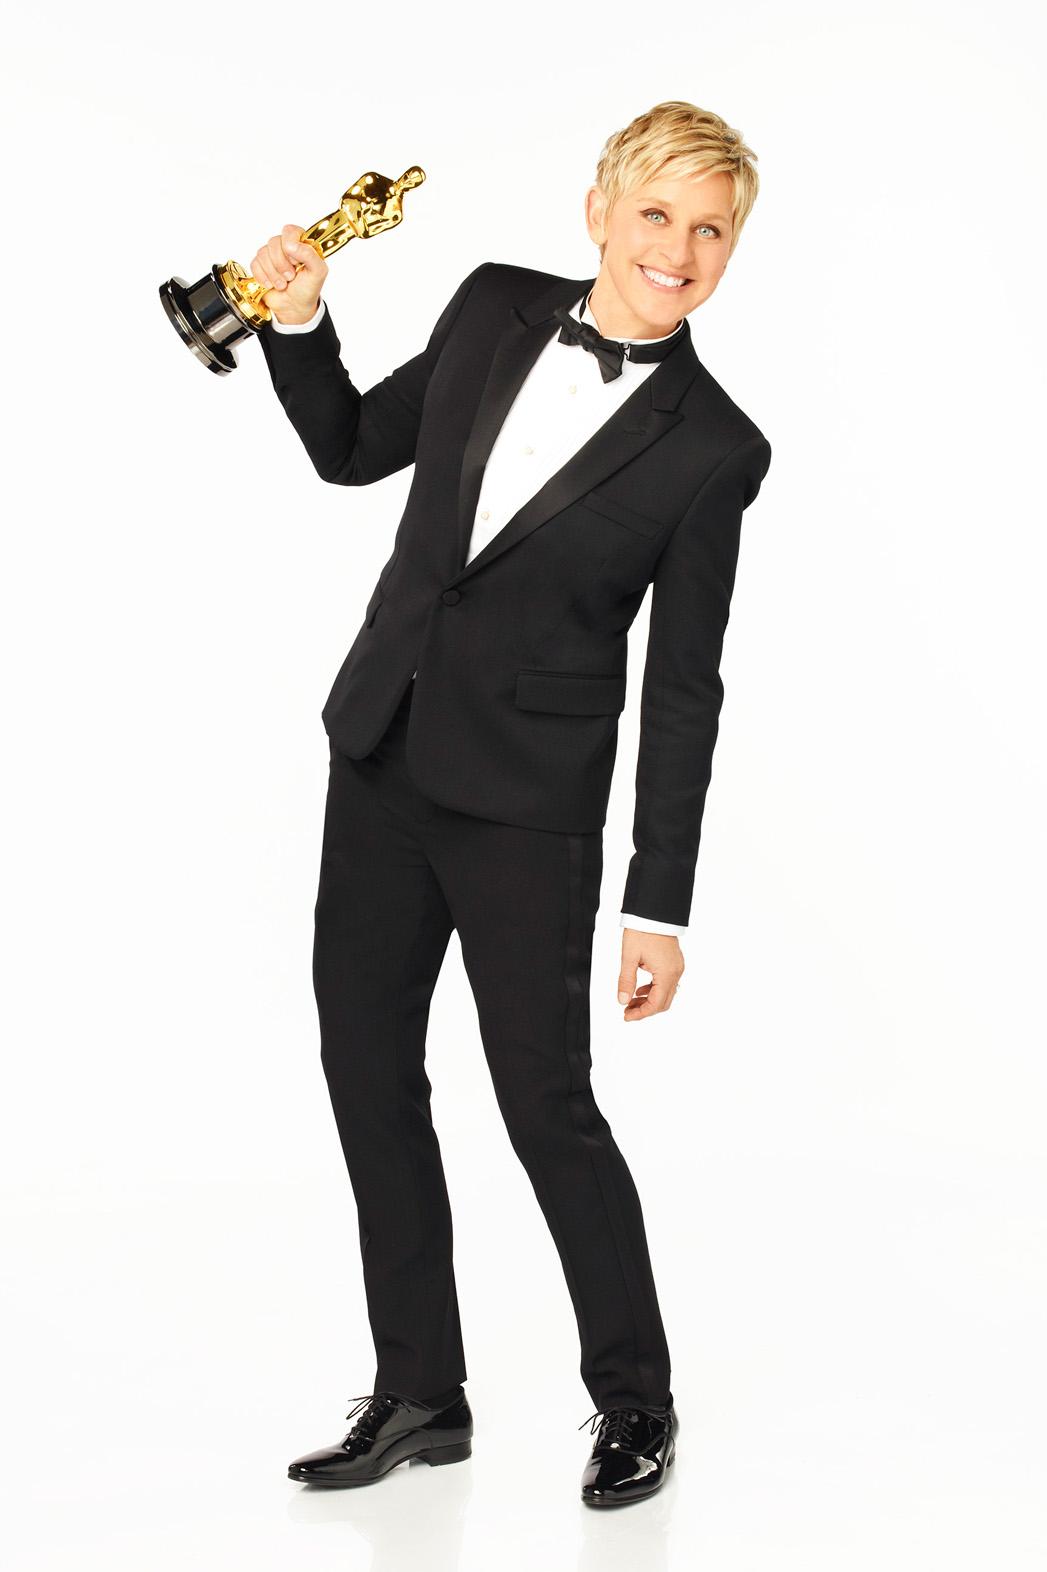 Ellen DeGeneres Oscars Host PR 3 - P 2014